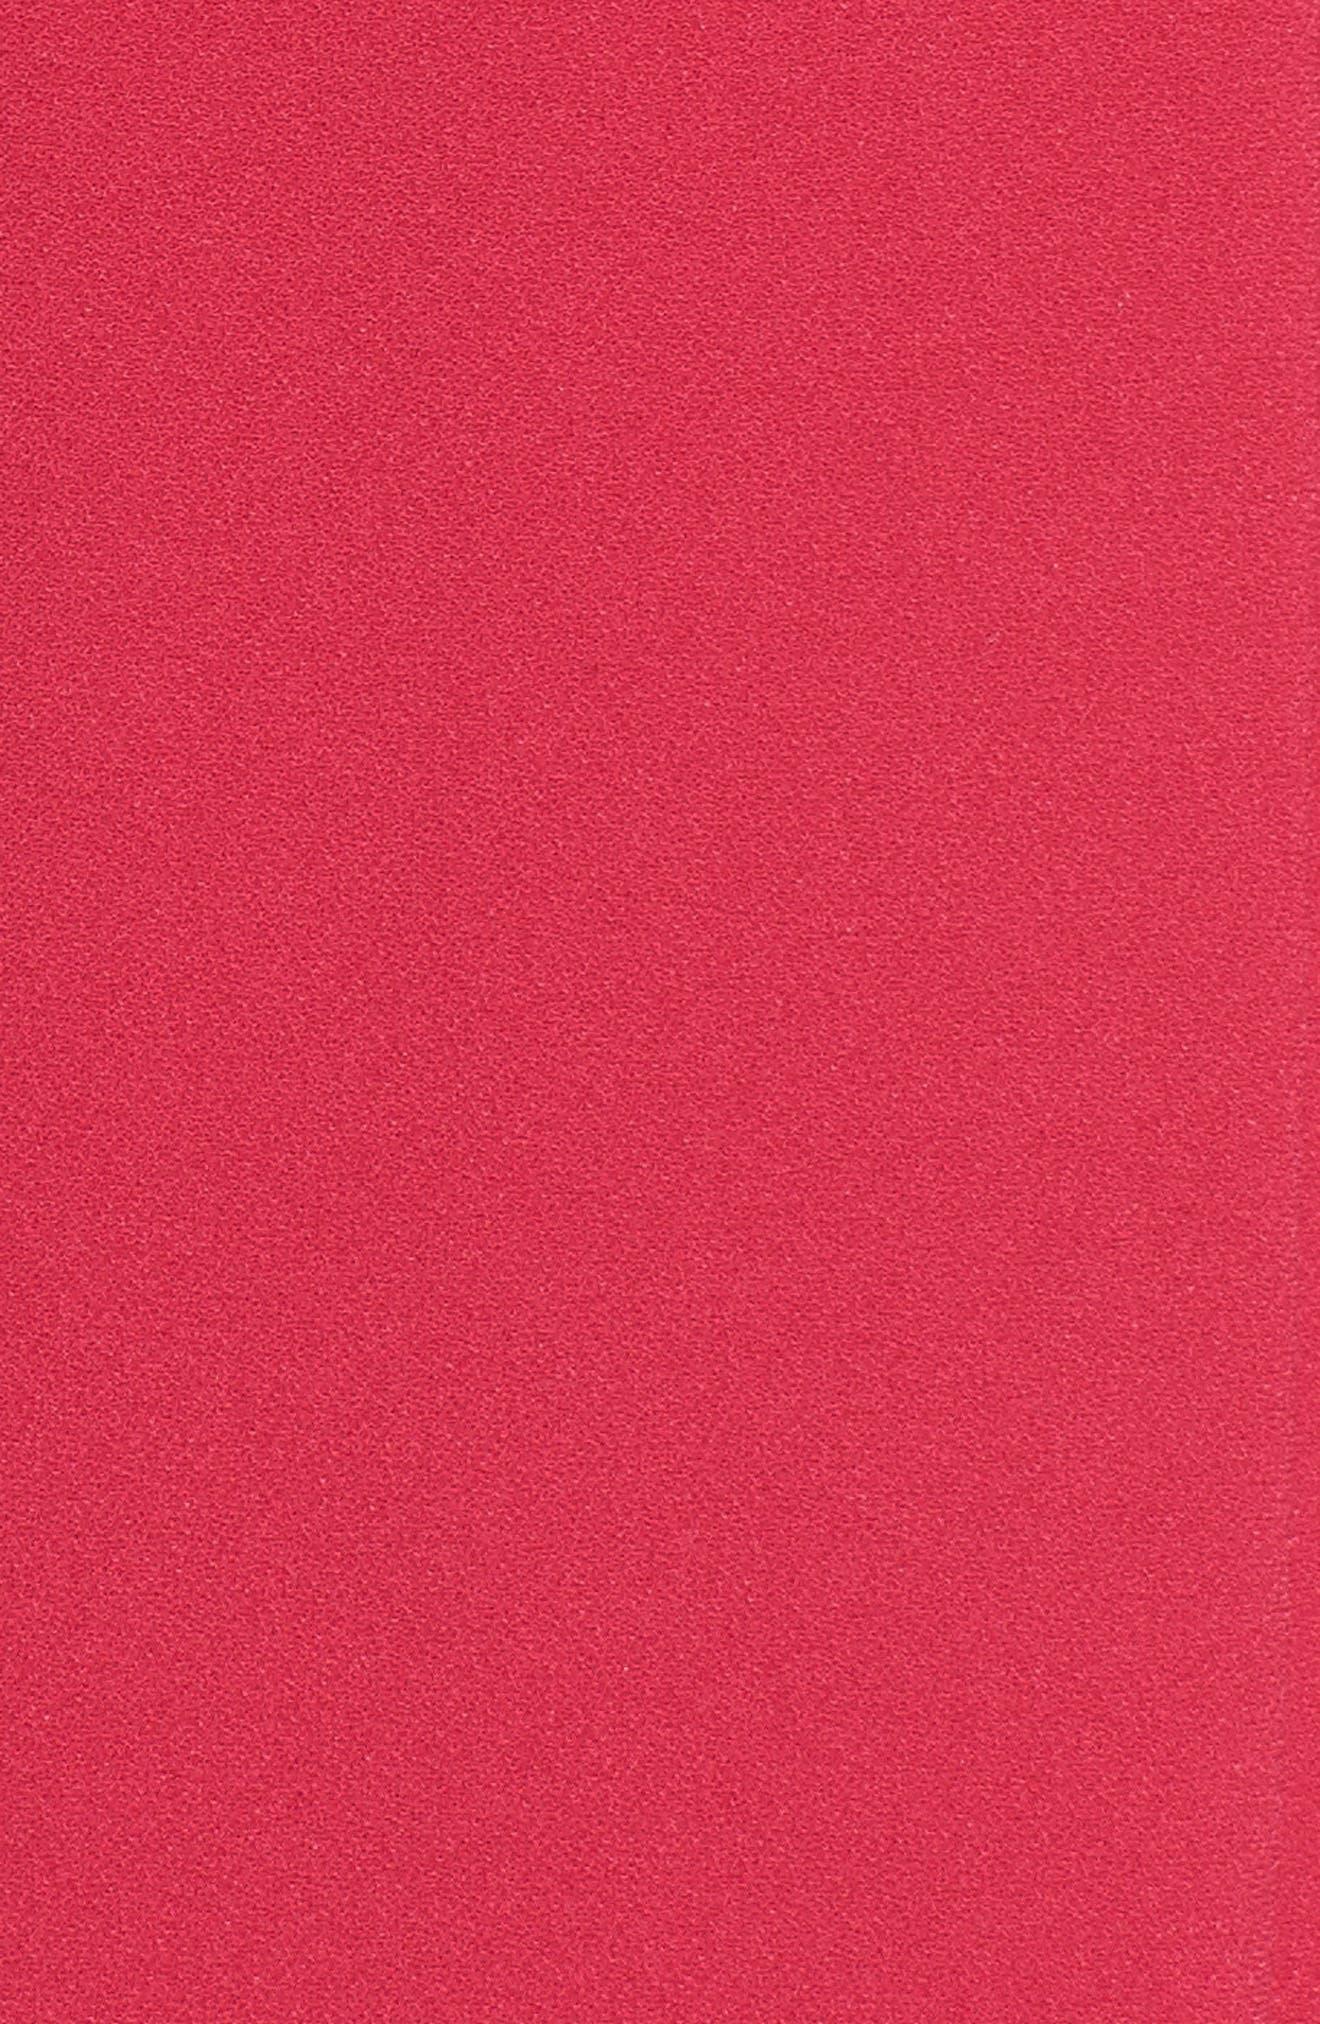 Alternate Image 5  - Tahari Scallop Neck A-Line Dress (Plus Size)